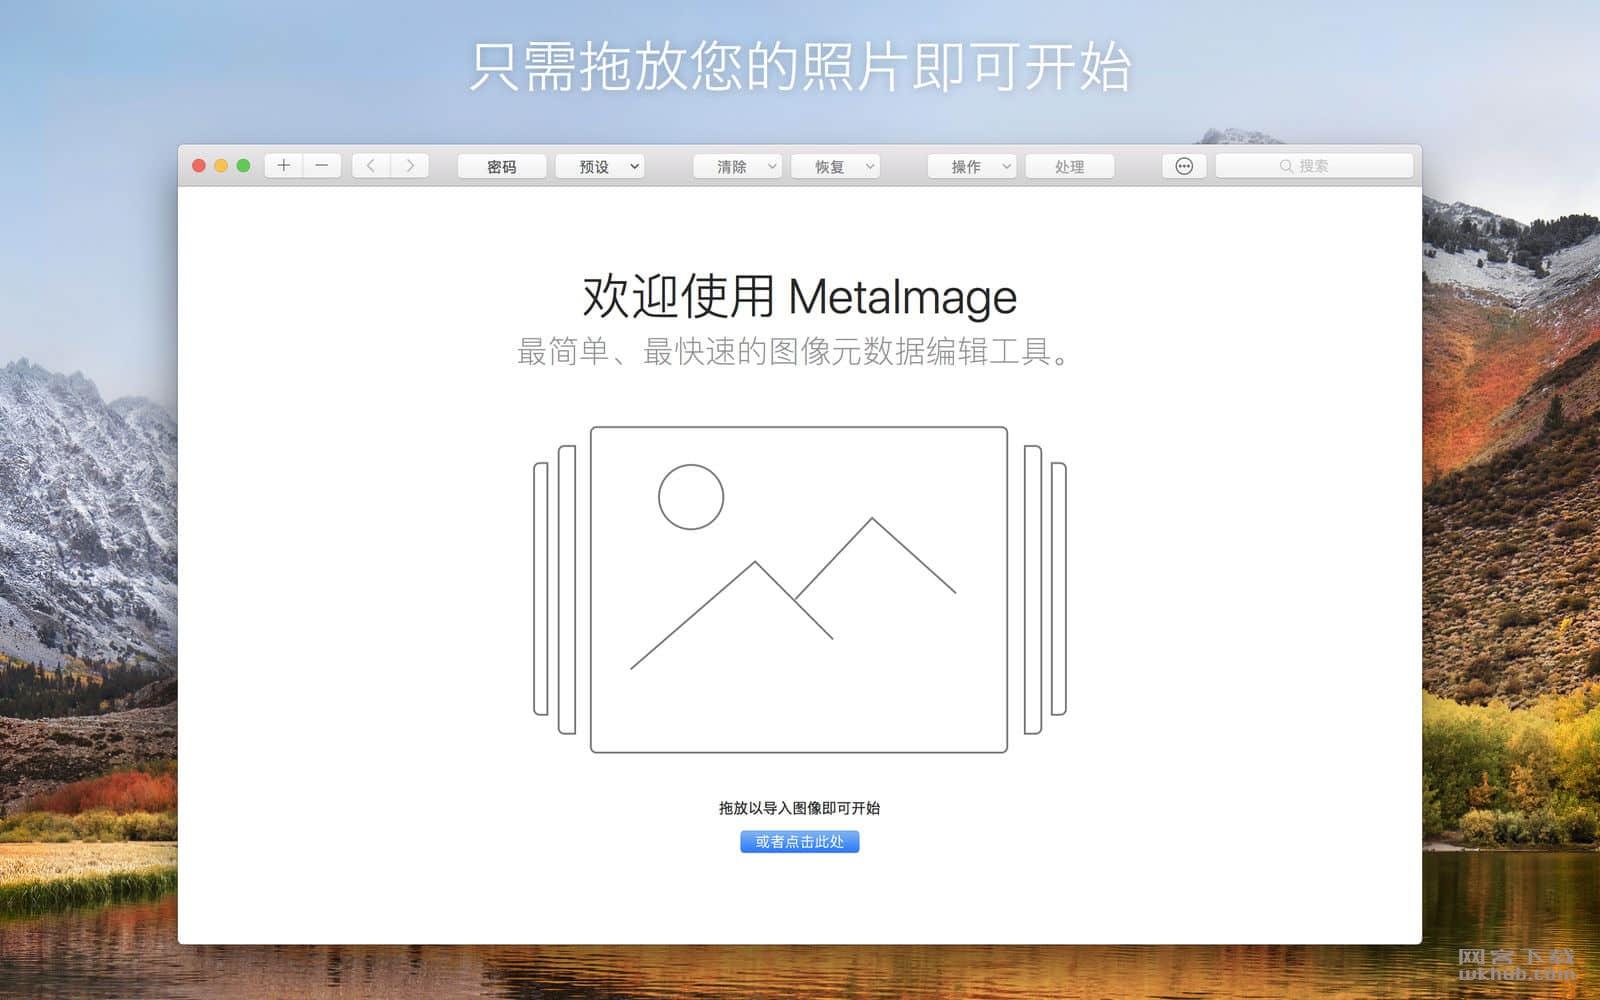 MetaImage 1.3.3 图像元数据编辑工具